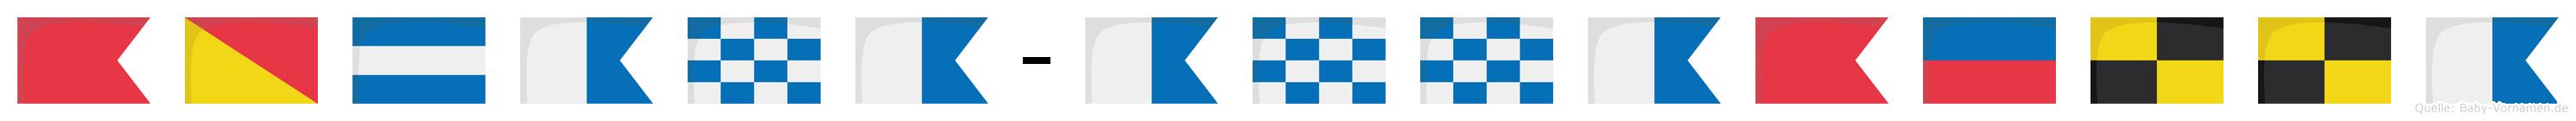 Bojana-Annabella im Flaggenalphabet